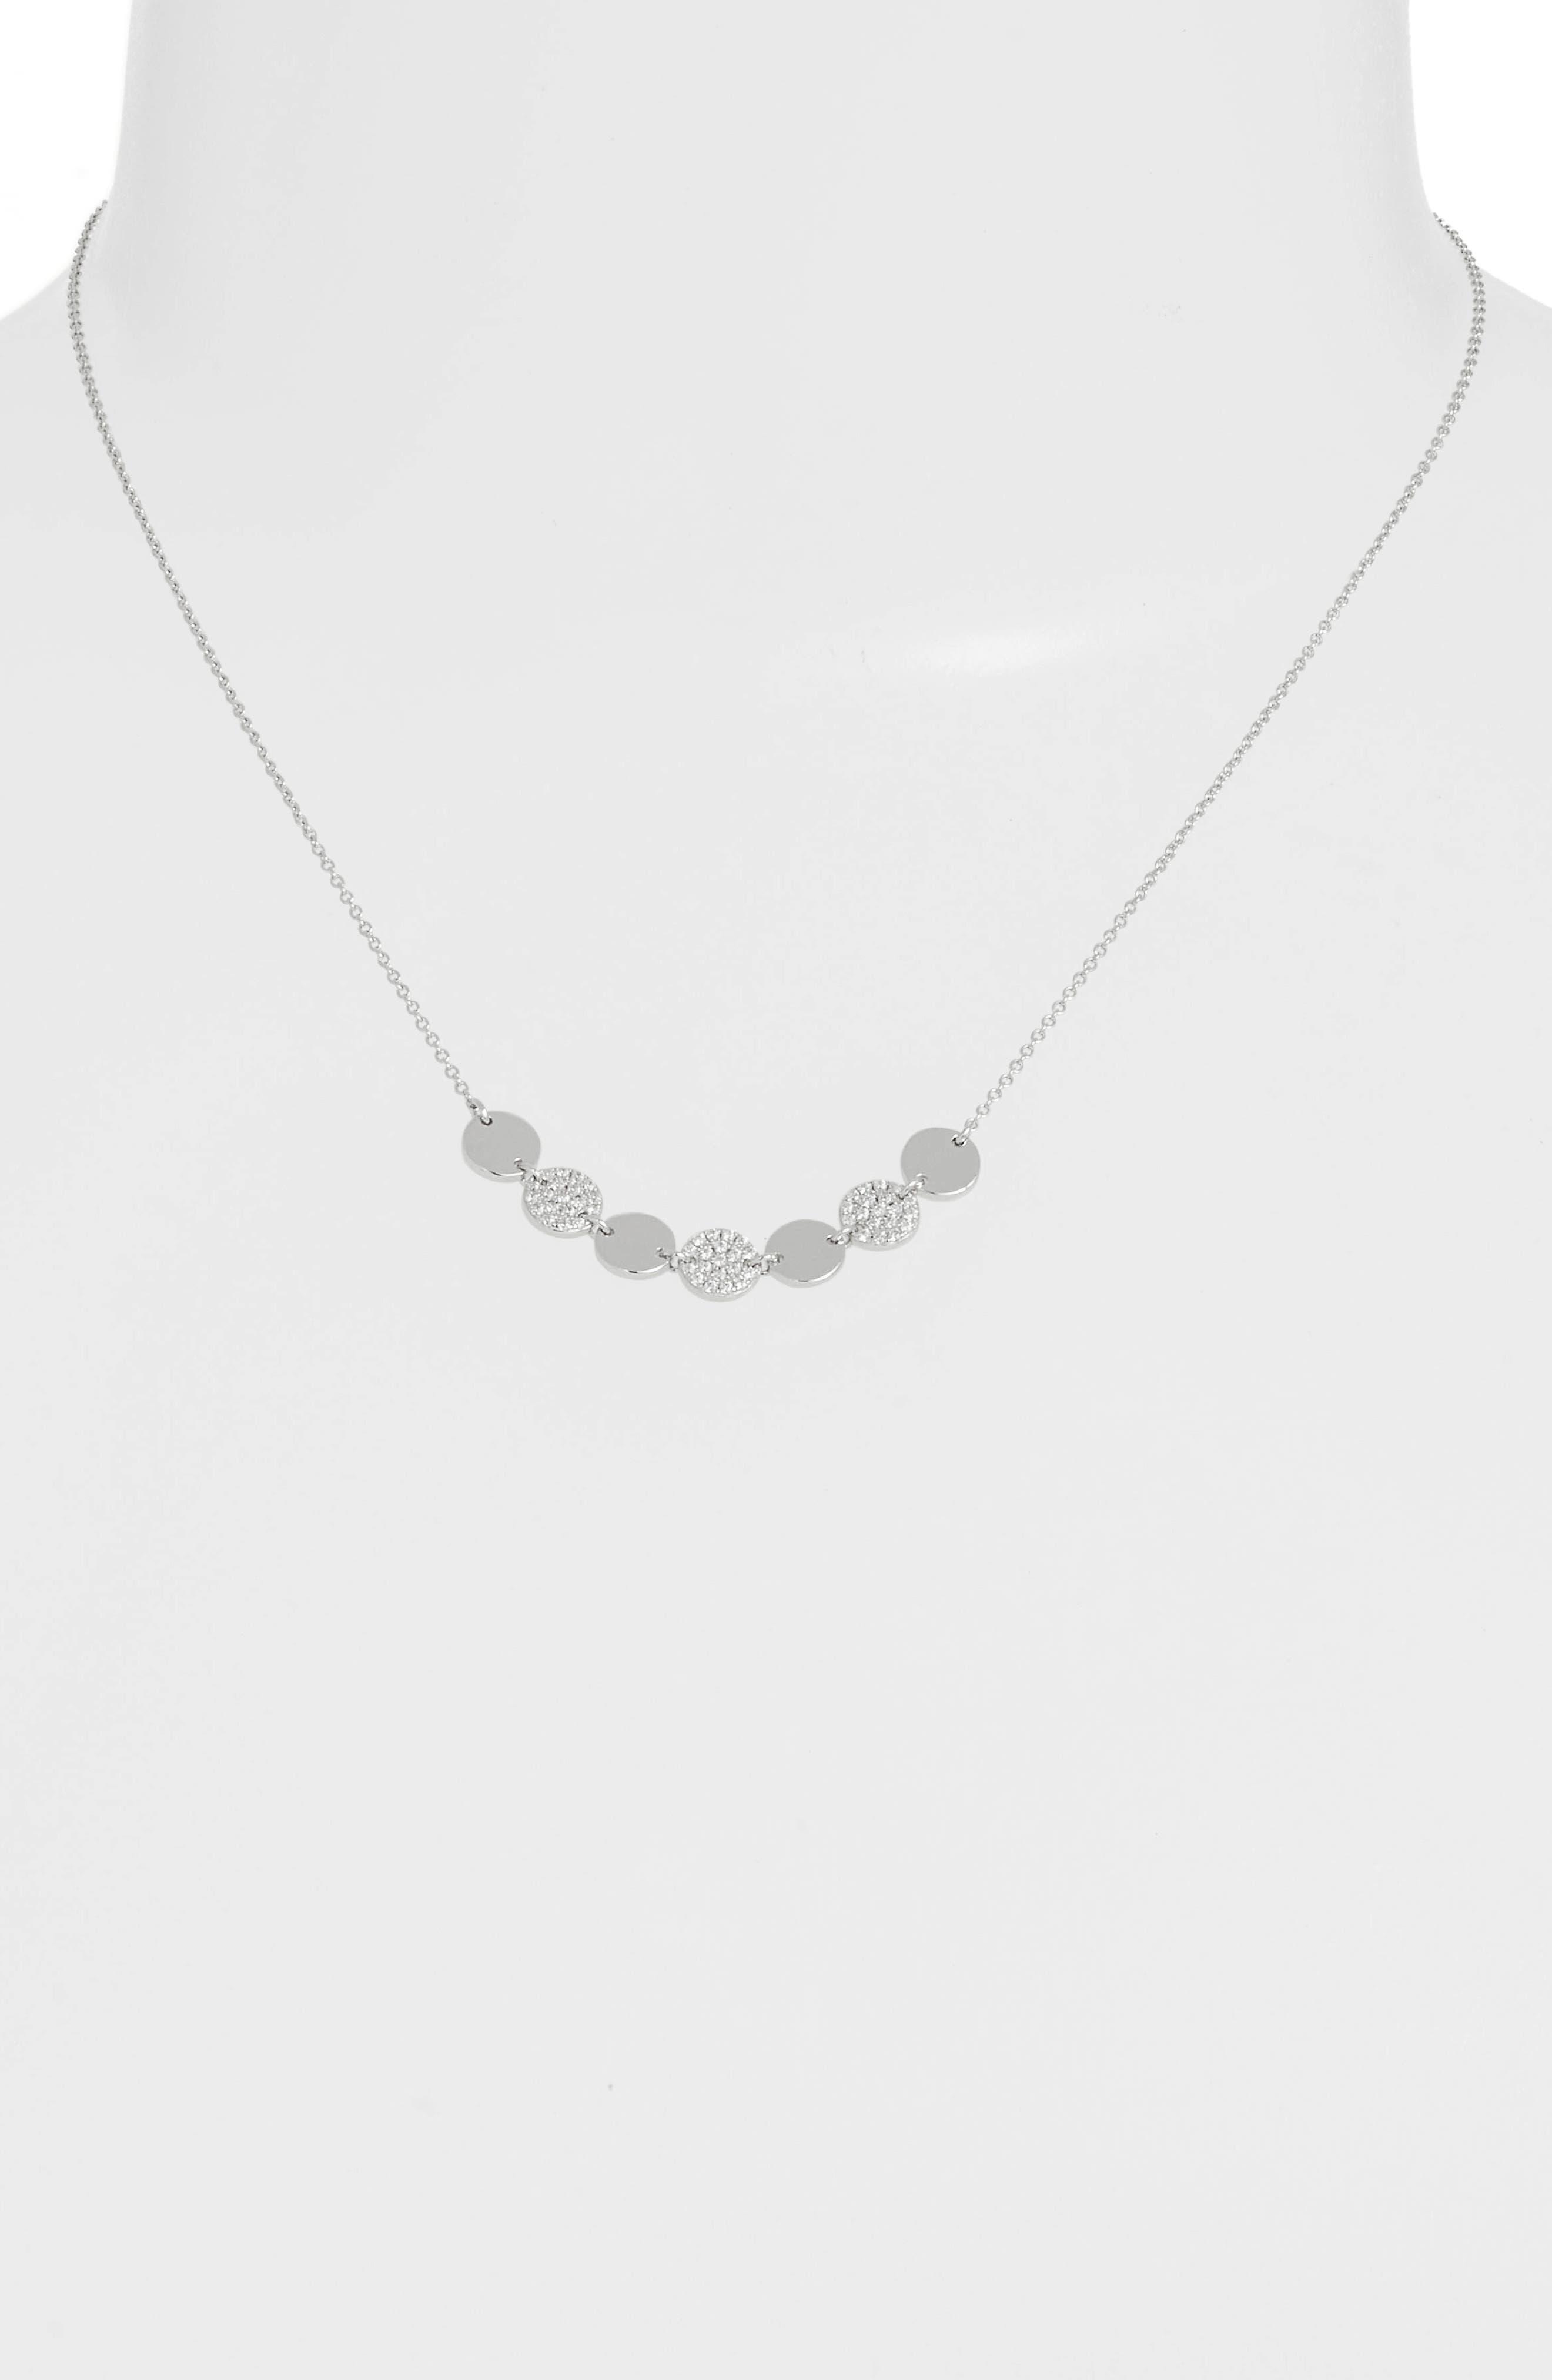 7 Symbols of Joy Choker Necklace,                             Alternate thumbnail 2, color,                             SILVER/ CLEAR